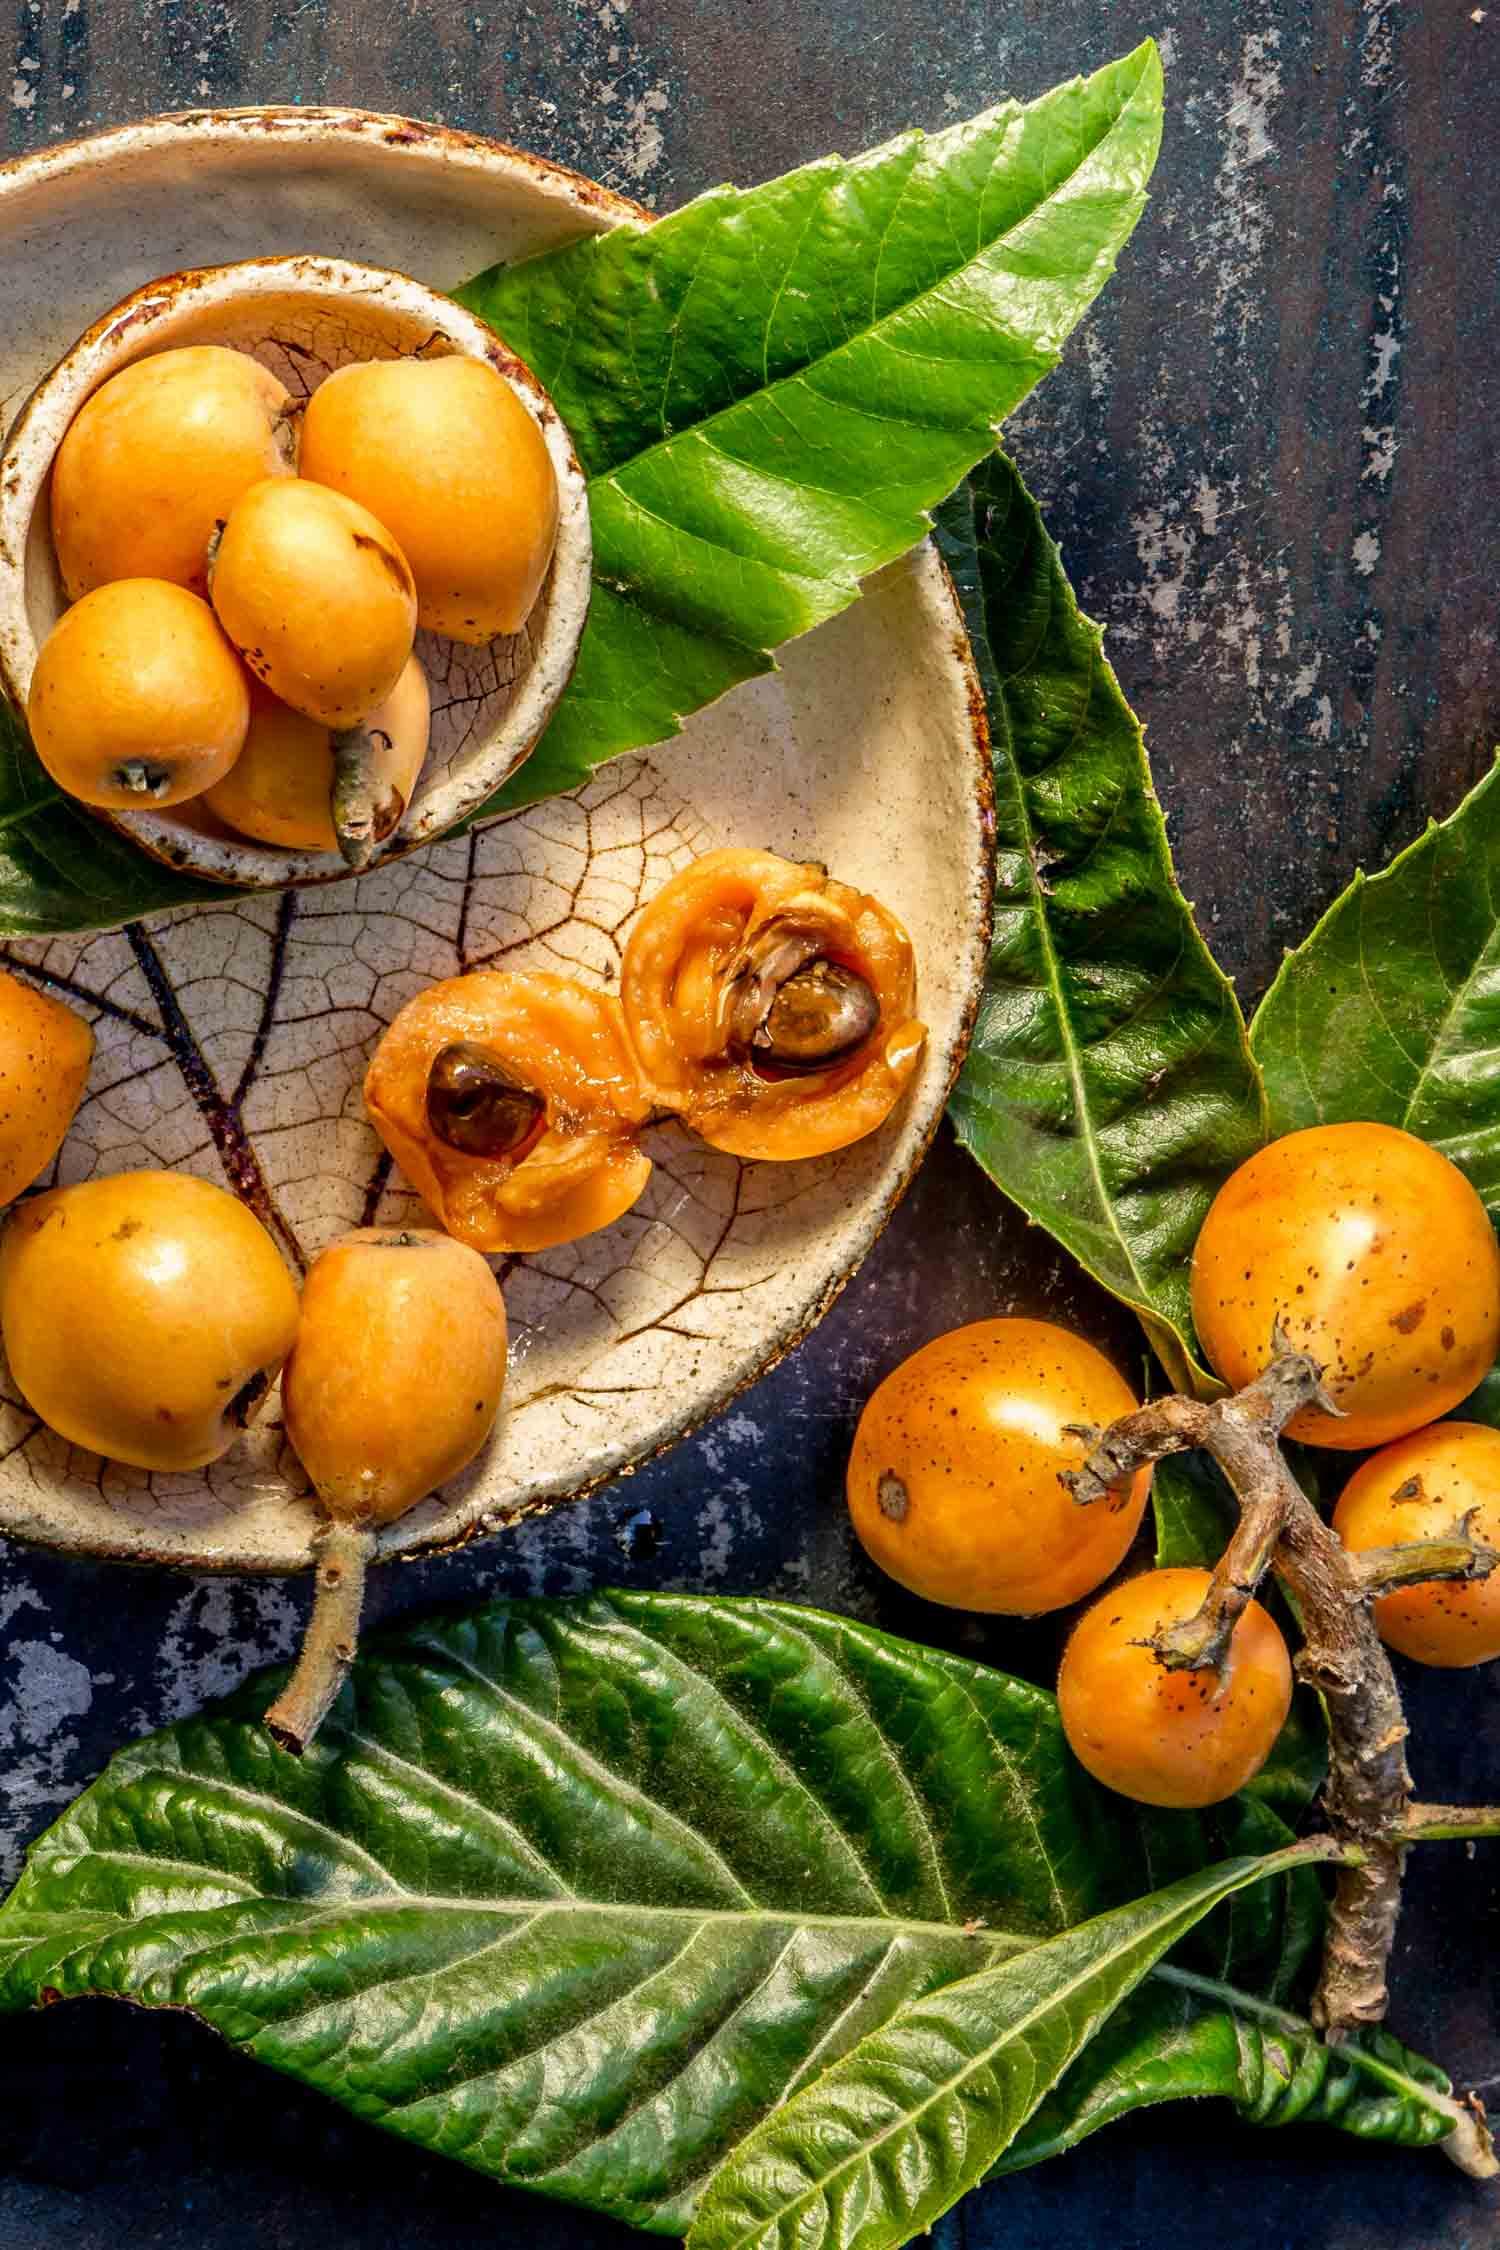 Hawaiian Loquat fruit. Nispero. Eriobotrya Japonica. Loquat with fresh leaves on metal background.